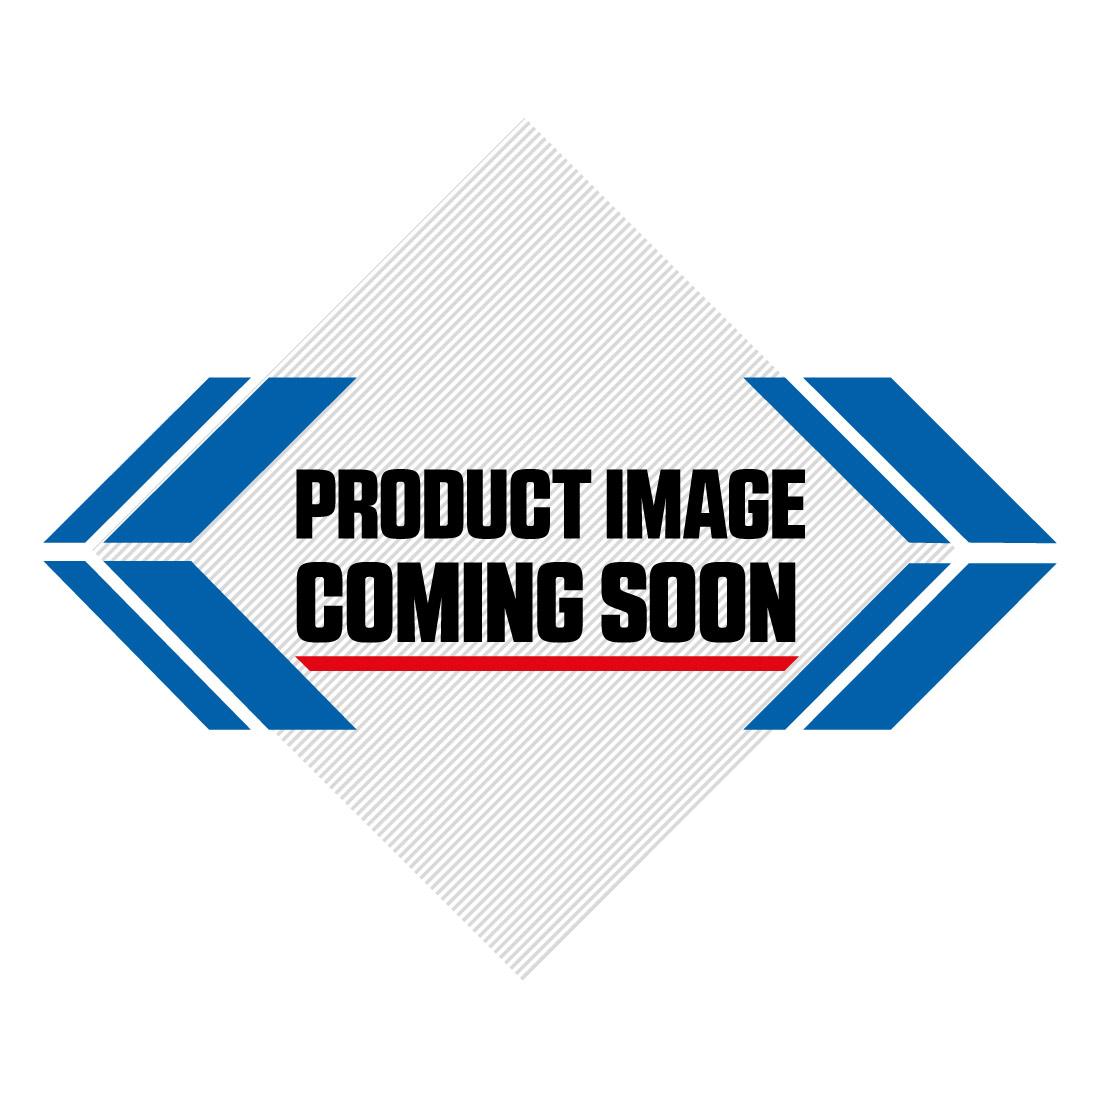 Honda Plastic Kit CRF 250 (14-17) CRF 450 (13-16) OEM Factory Image-3>